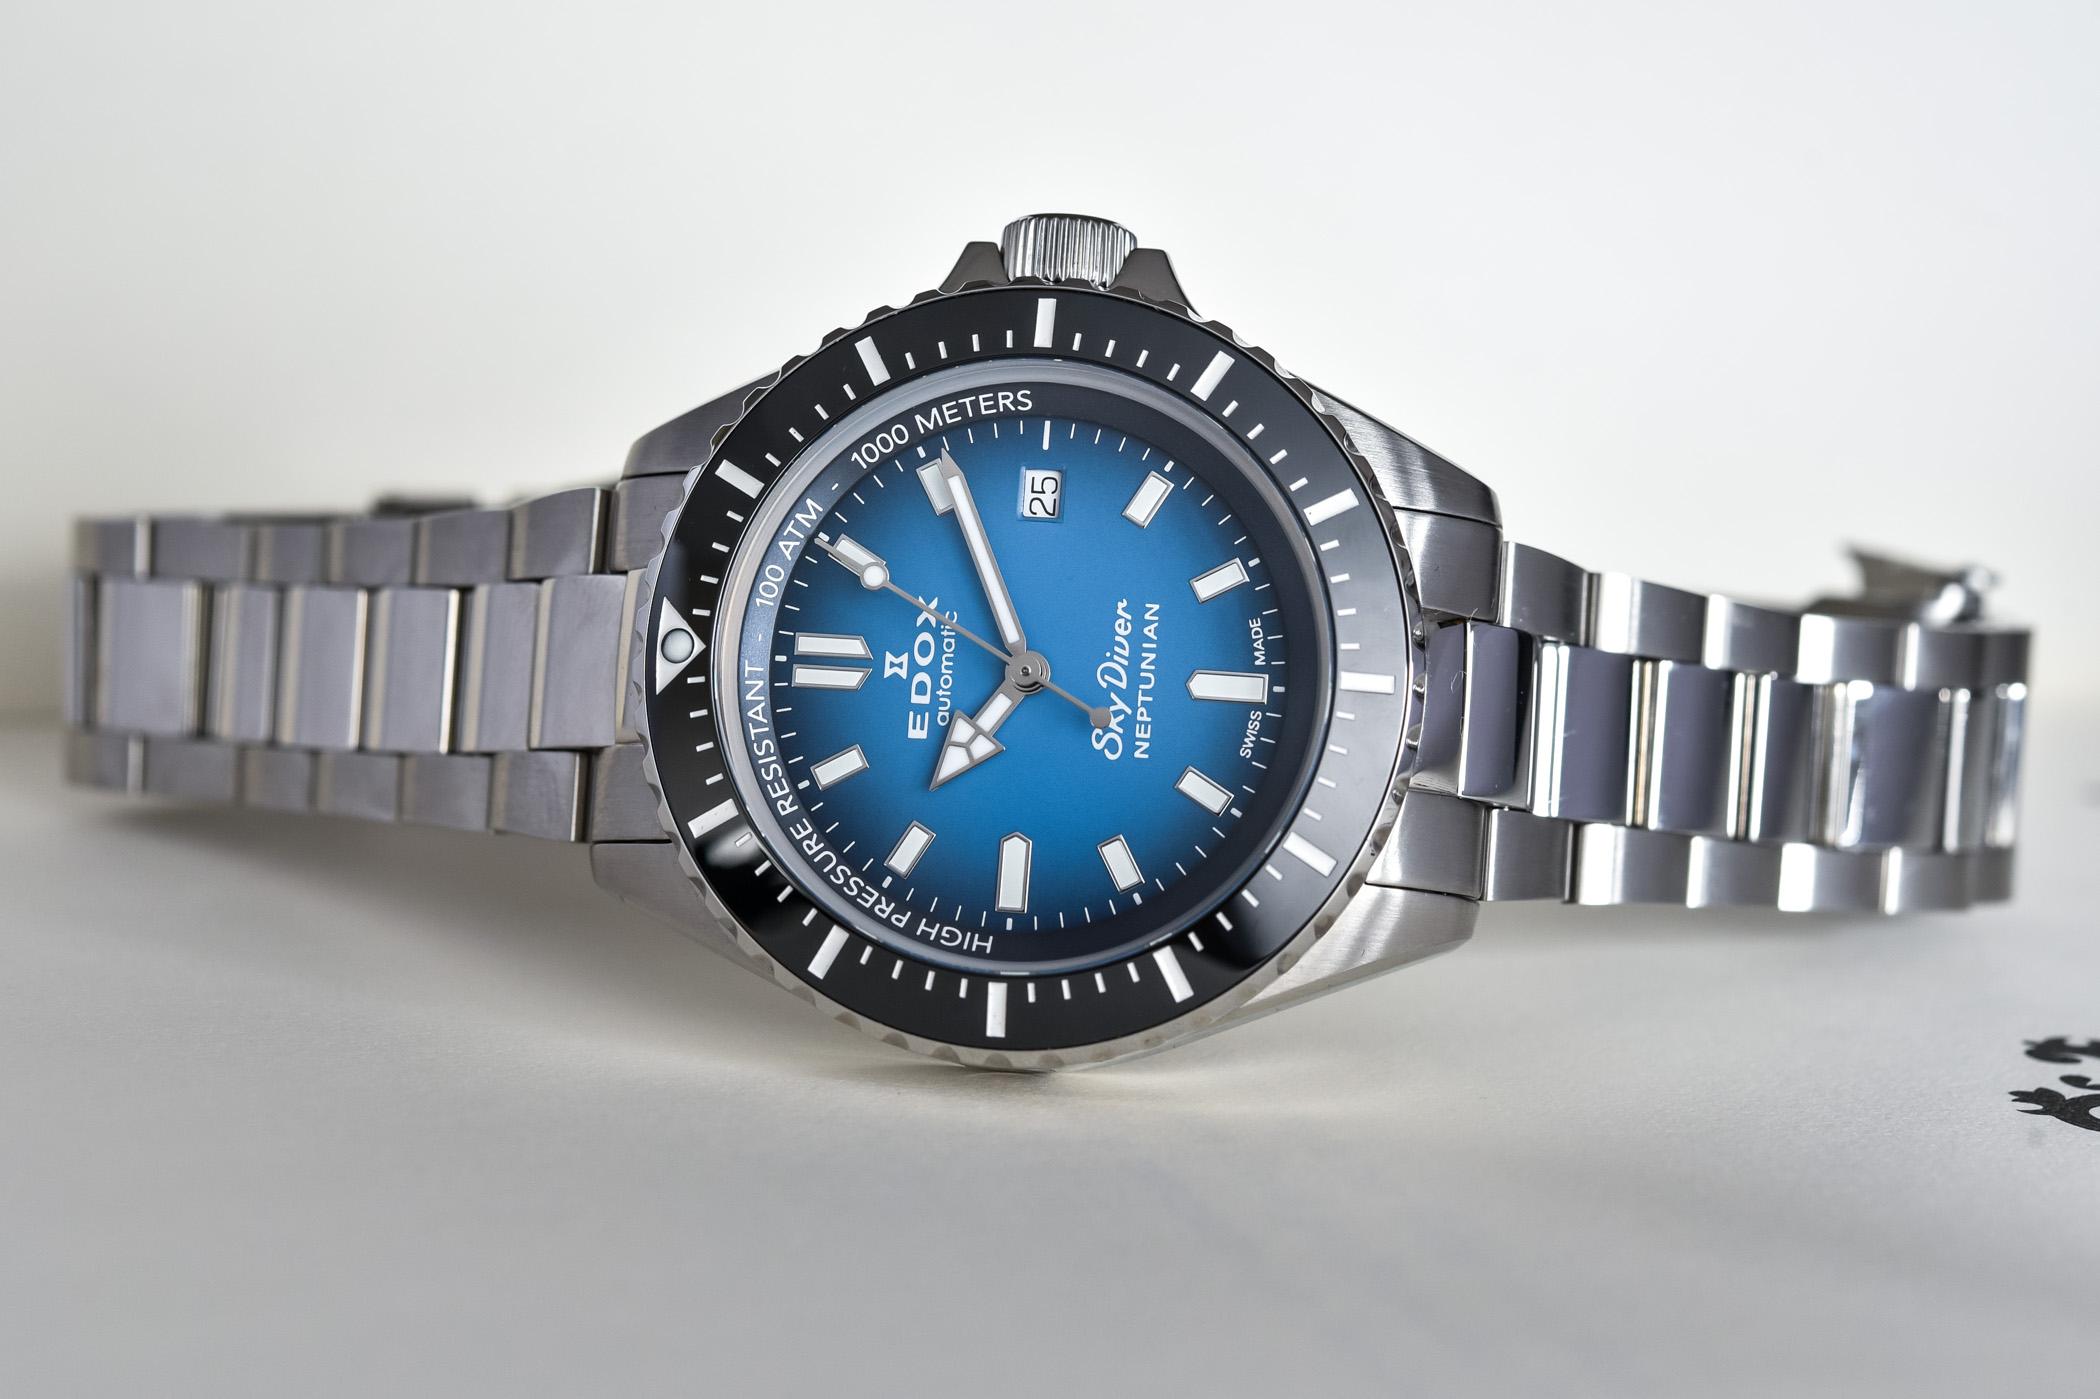 Edox SkyDiver Neptunian Deep Dive Watch 1000m